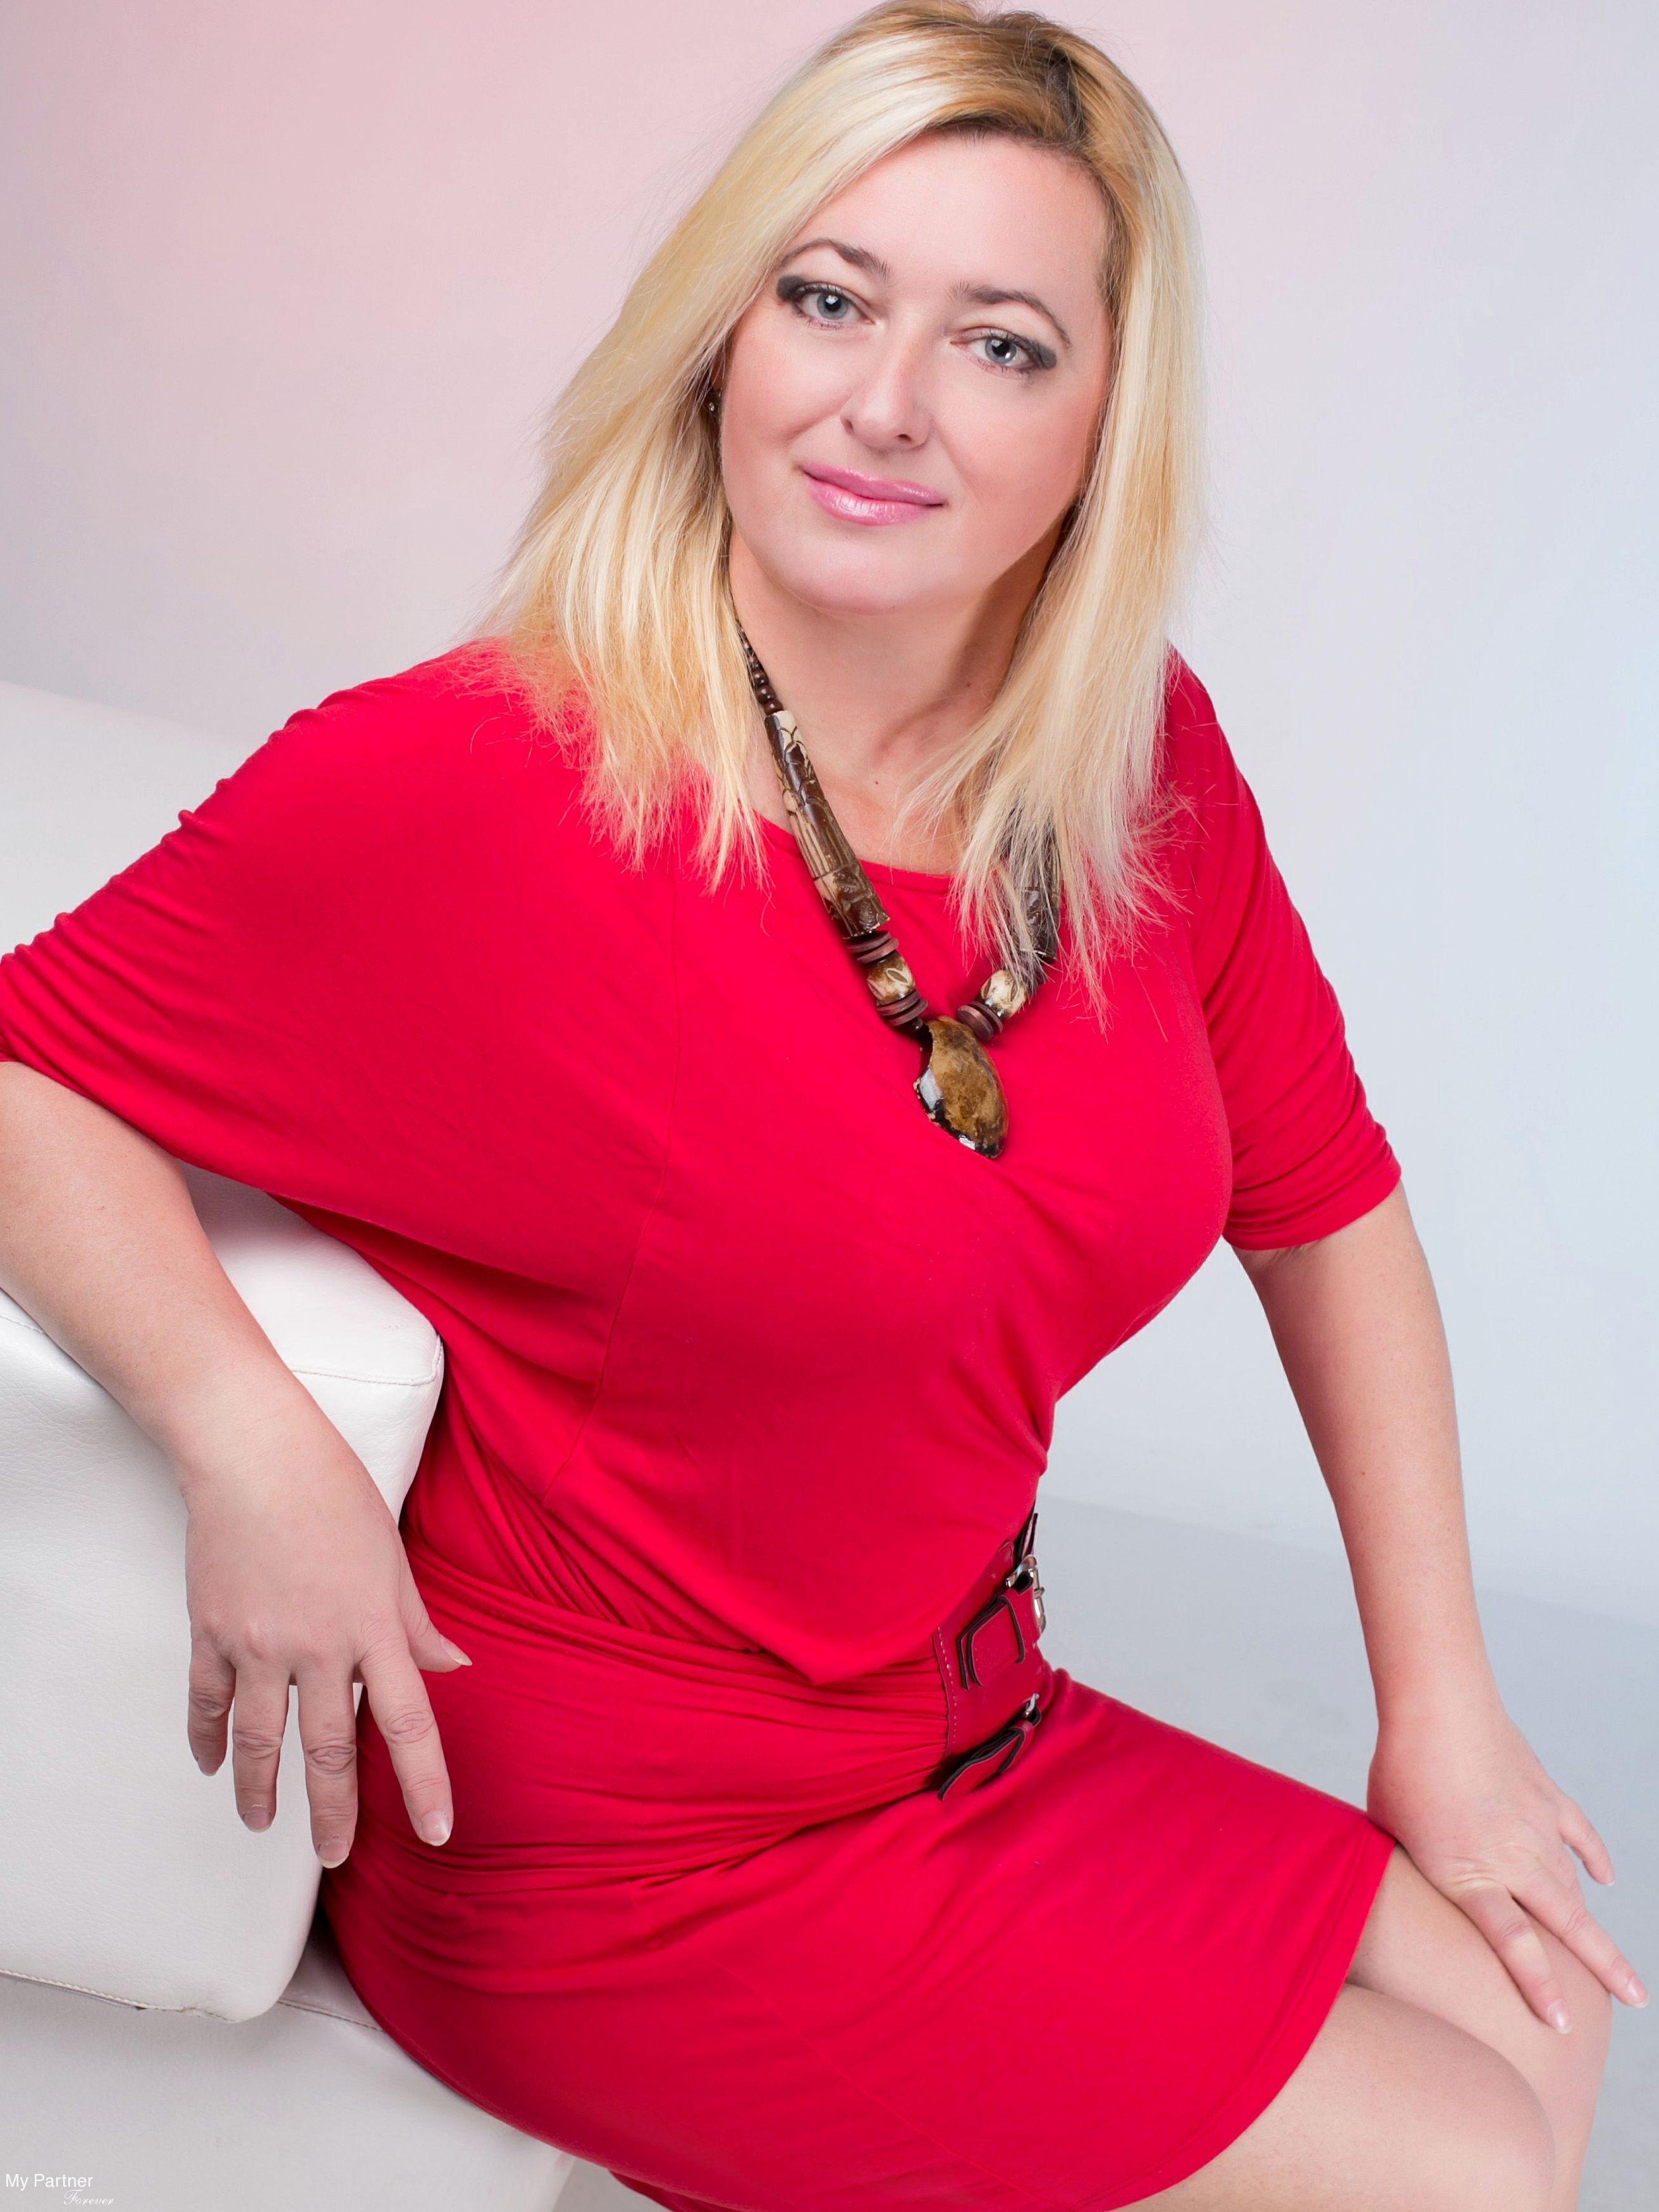 Imlive online ukraine dating